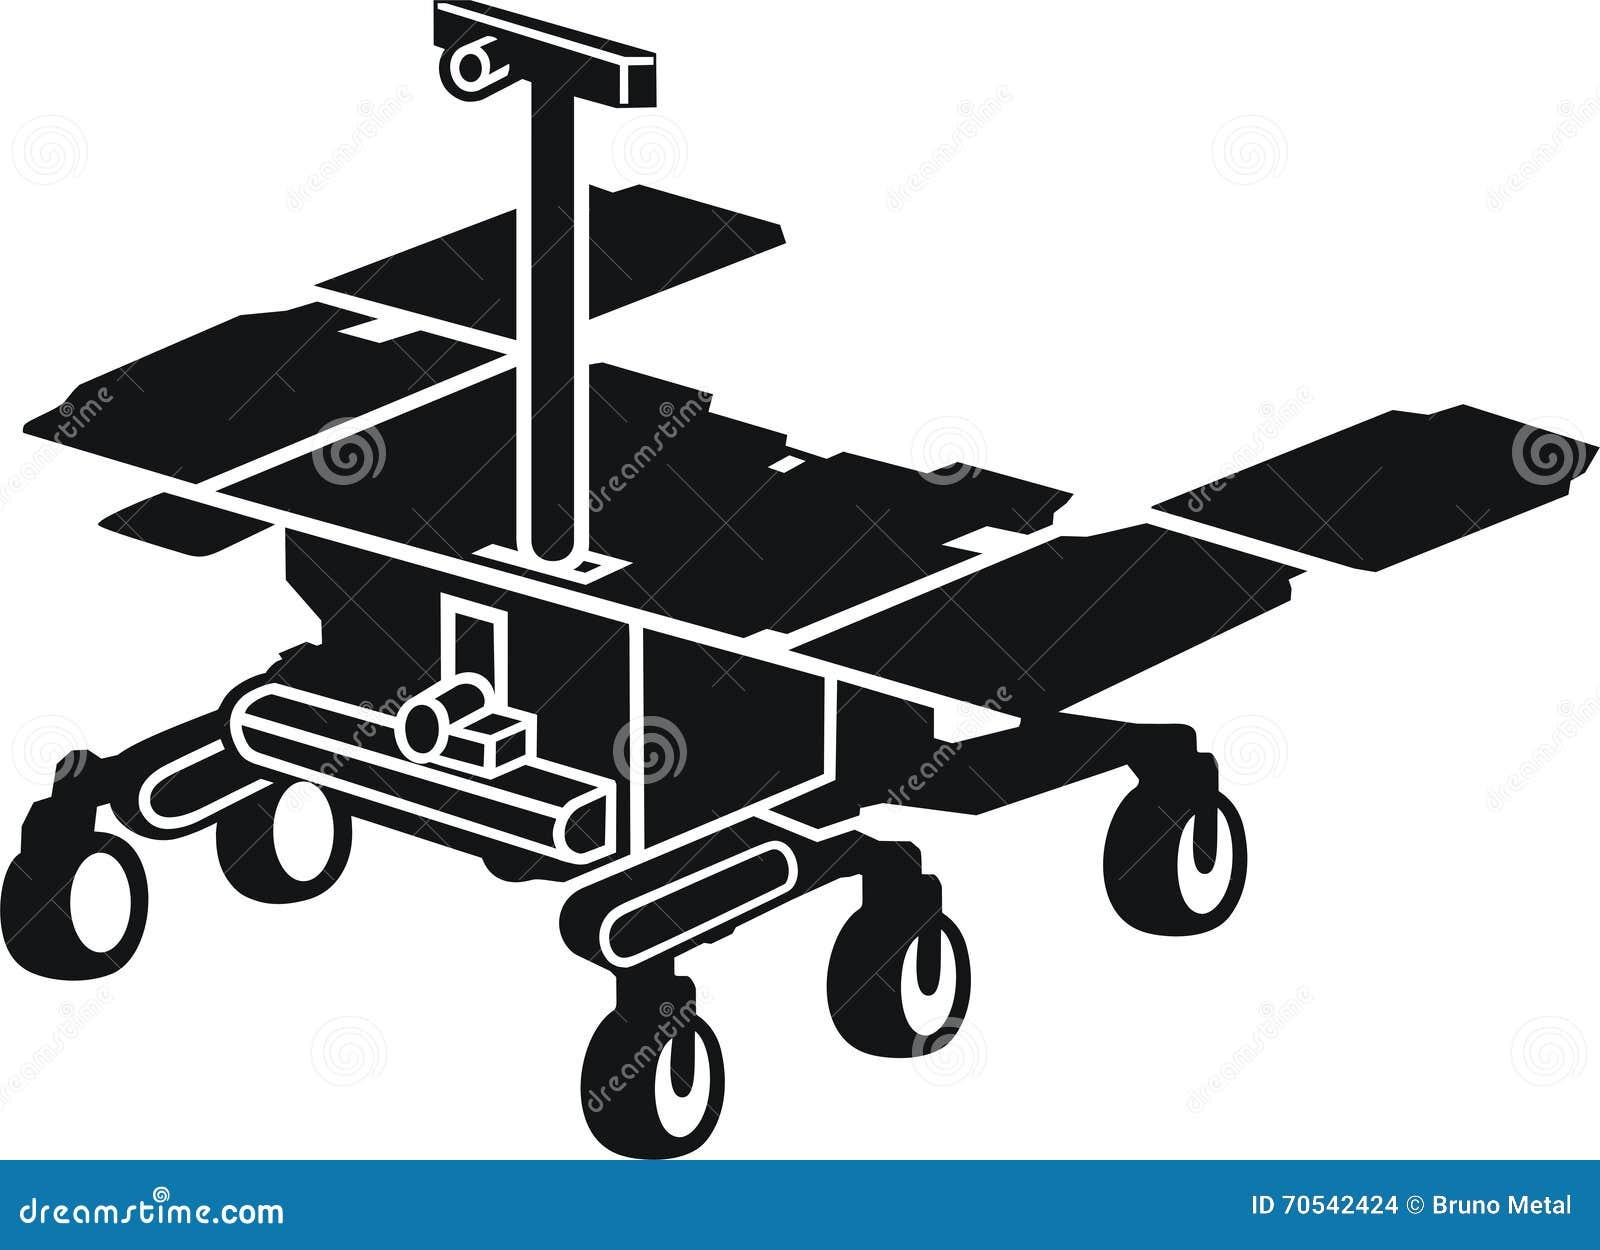 mars rover vector - photo #24